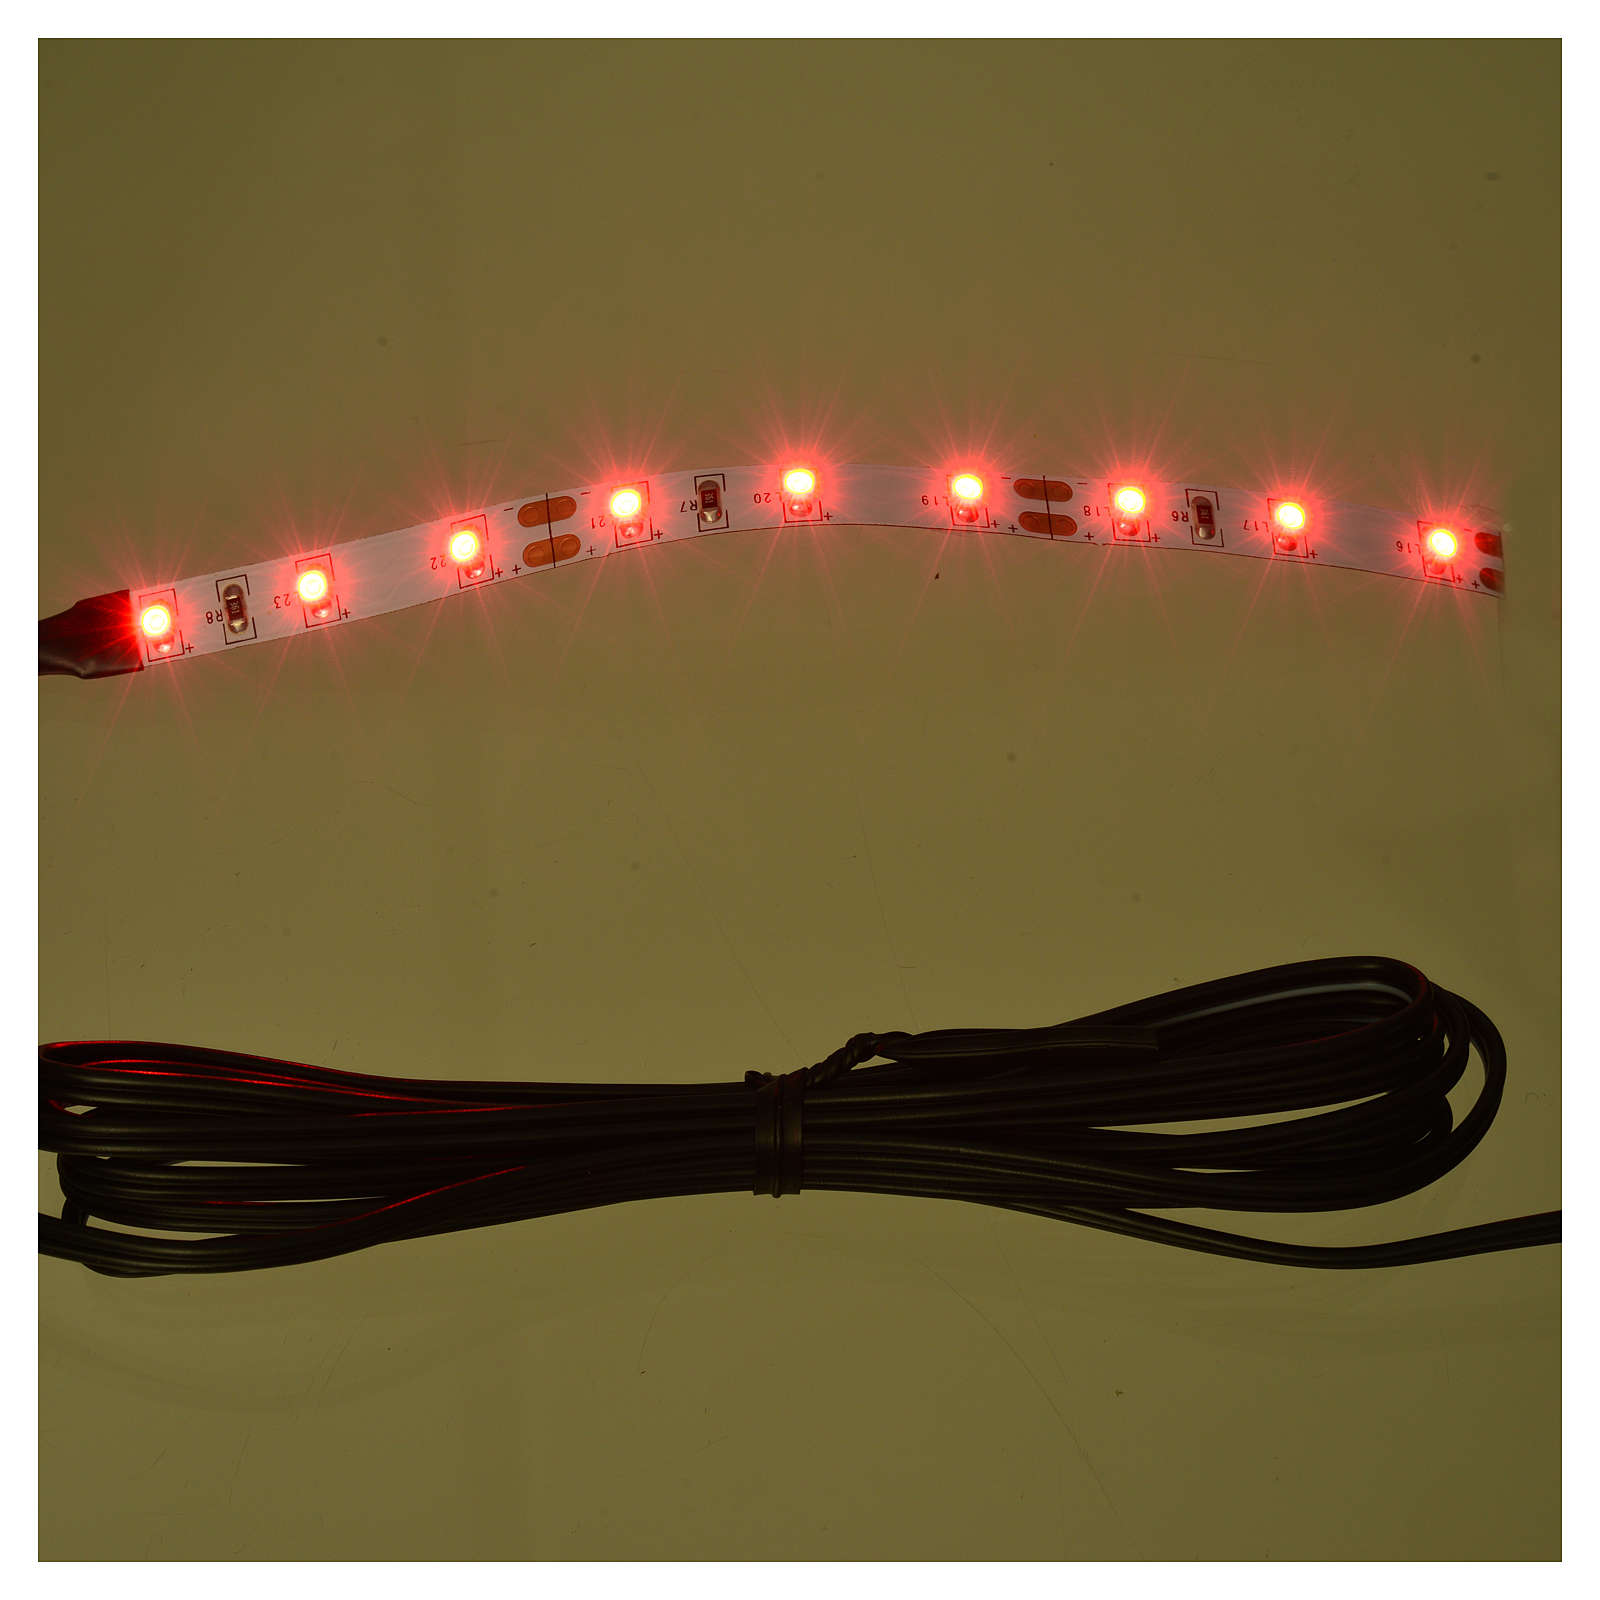 Tira de 9 LED cm. 0.8x12 cm. roja Frisalight 4